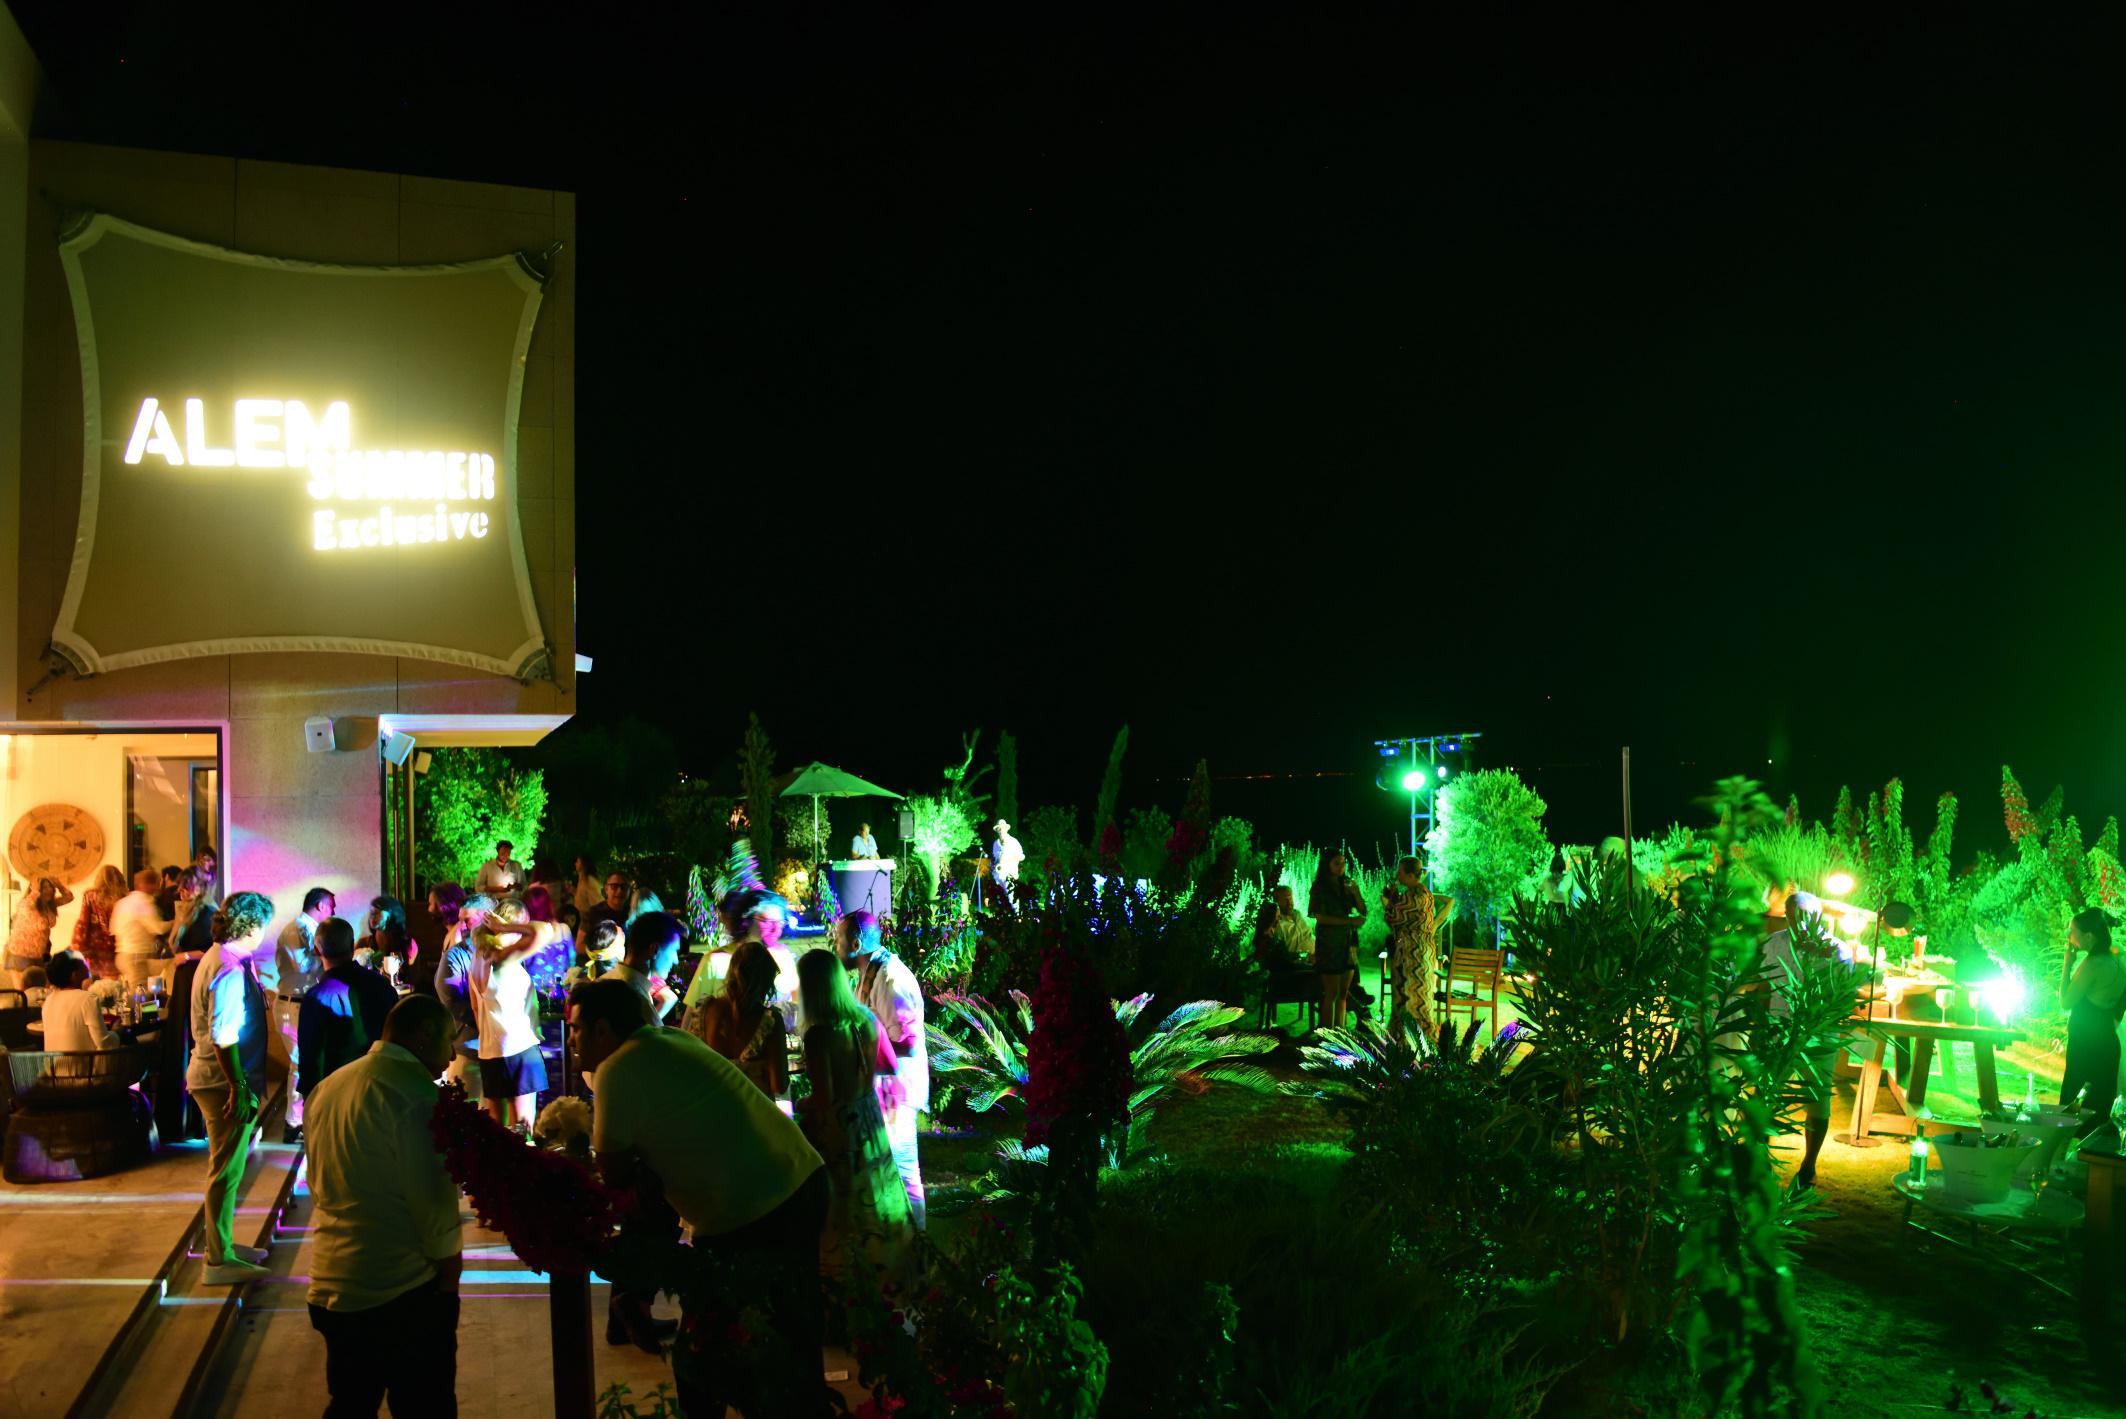 Bodrum'un en ses getiren partisi: Alem Summer gerçekleşti!